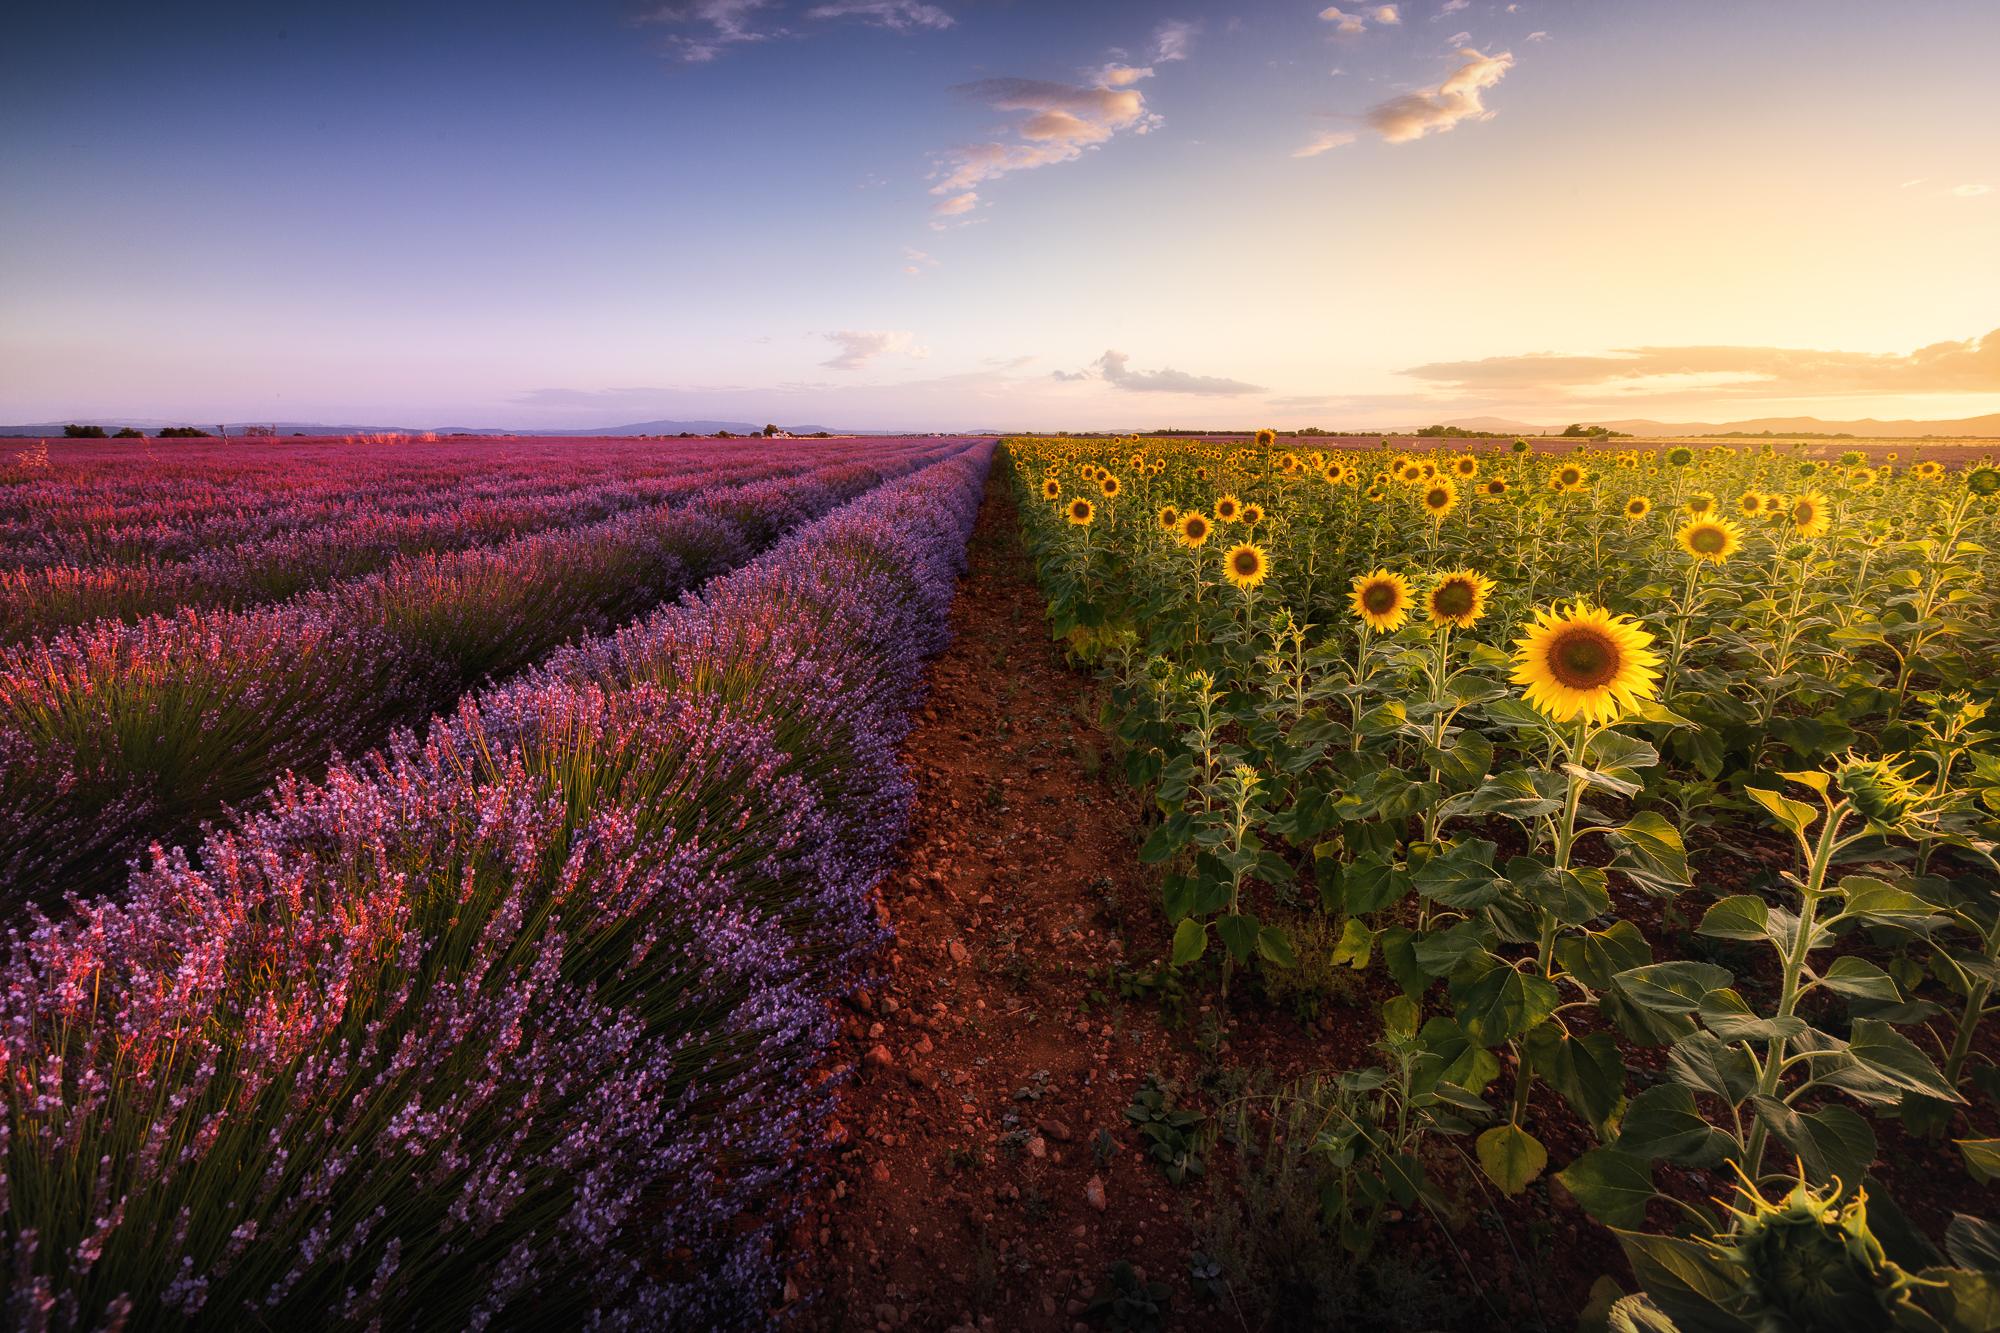 Valensole, France